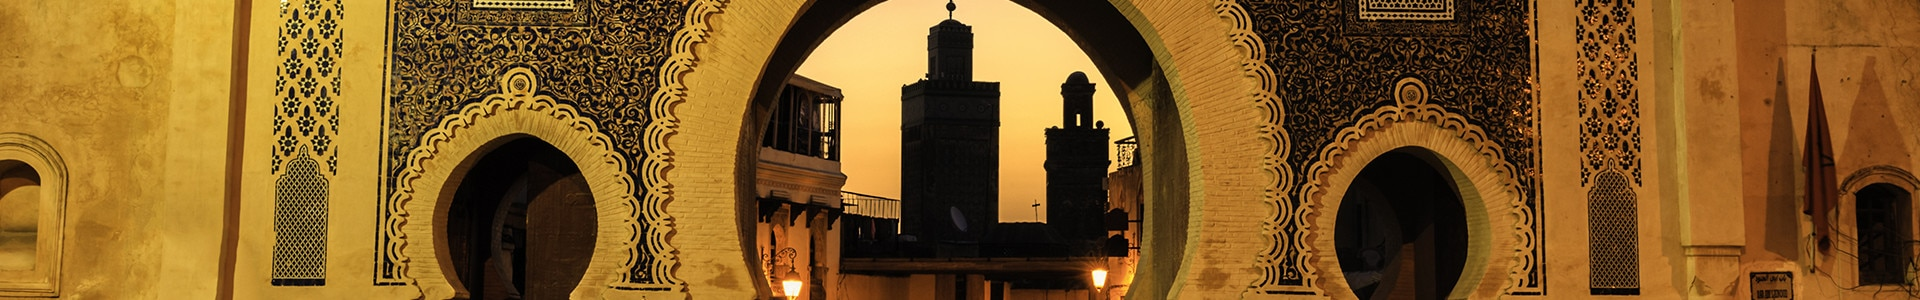 Vol Marrakech - TUI